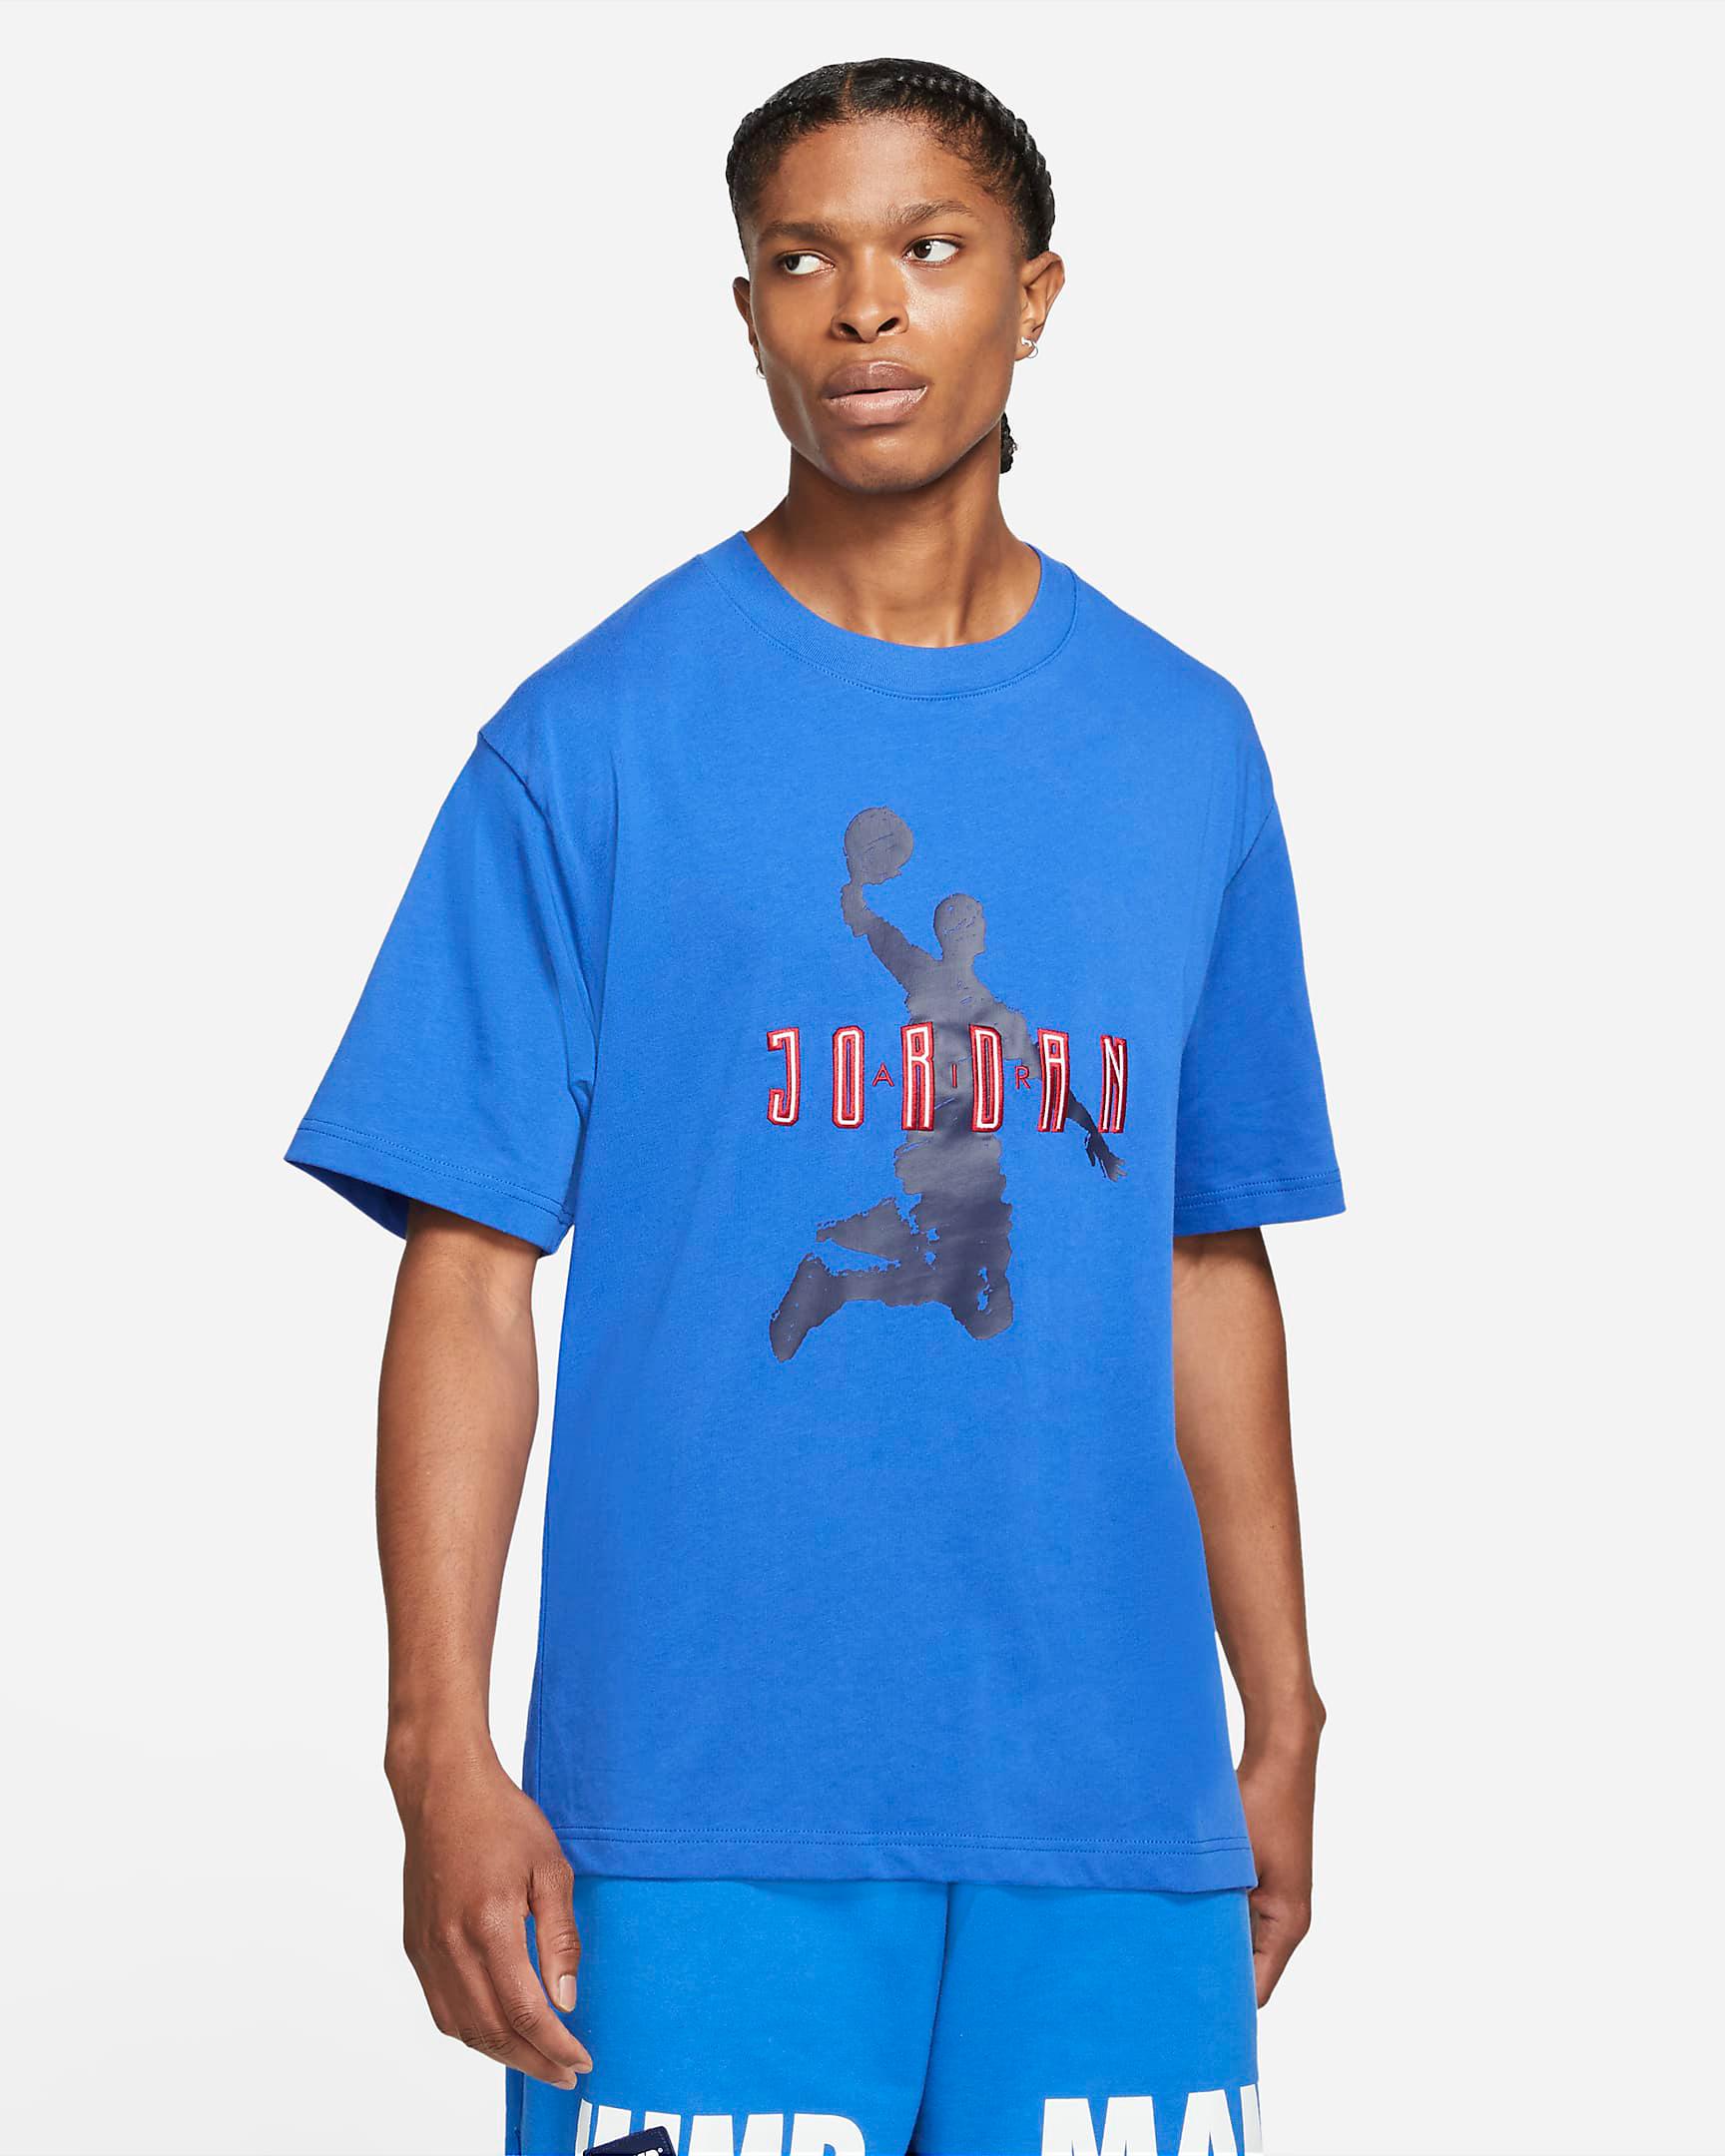 jordan-game-royal-sport-dna-shirt-1